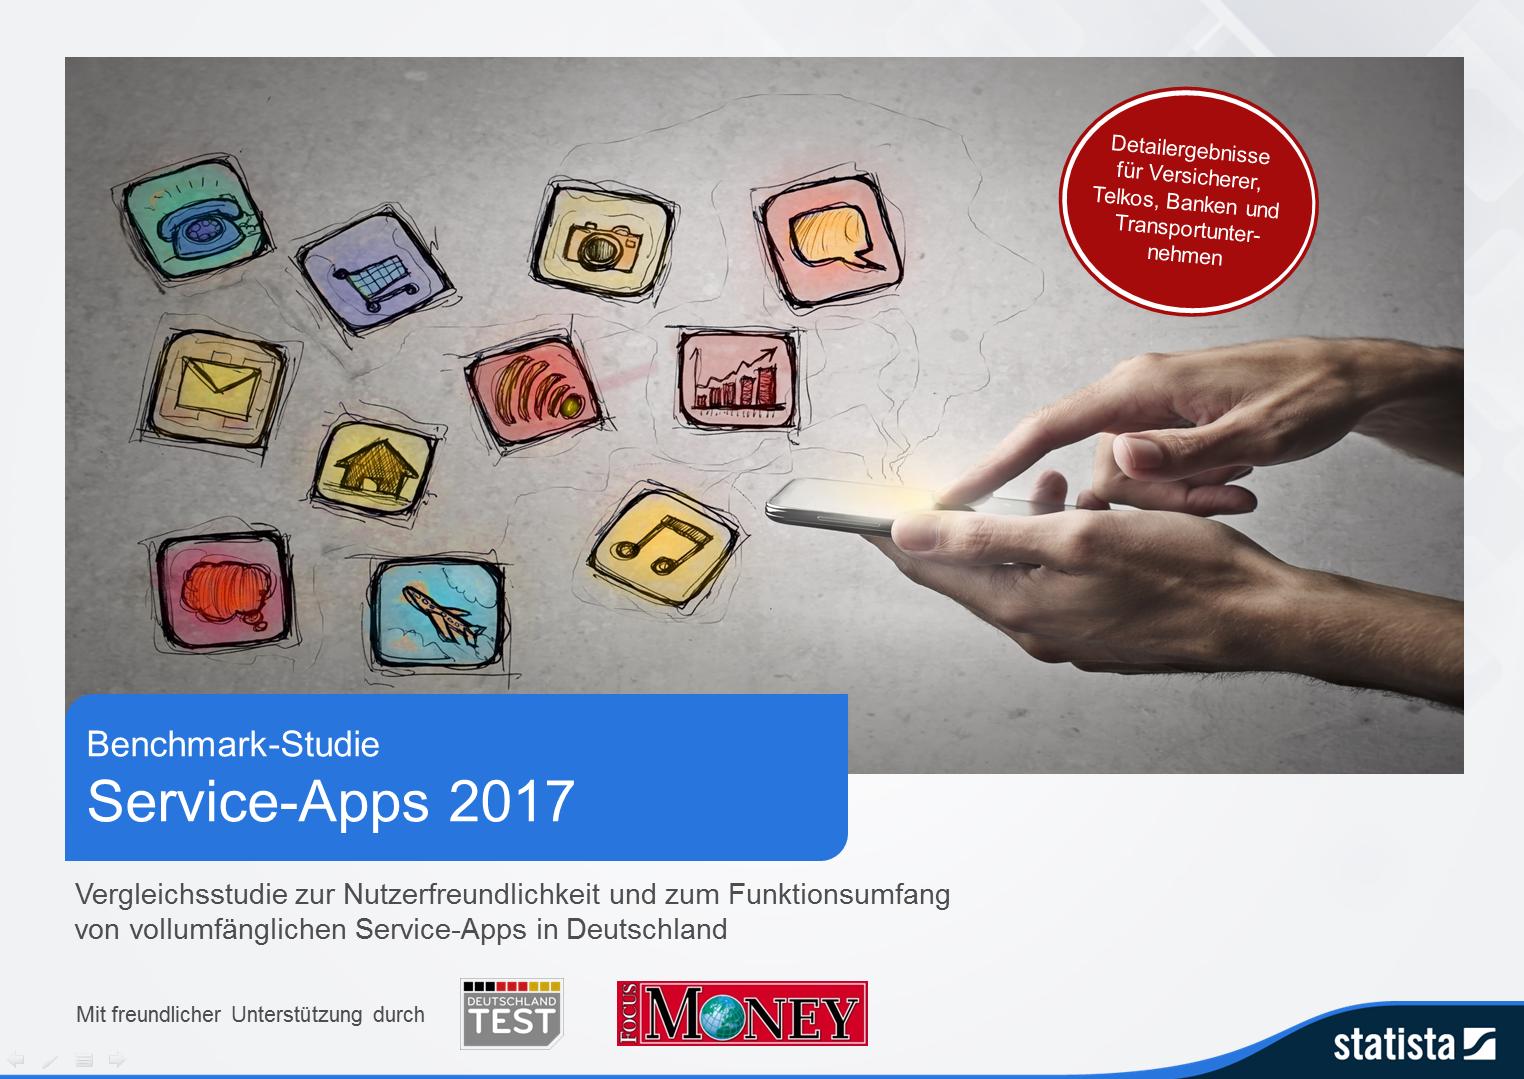 Benchmark Studie - Service-Apps 2017